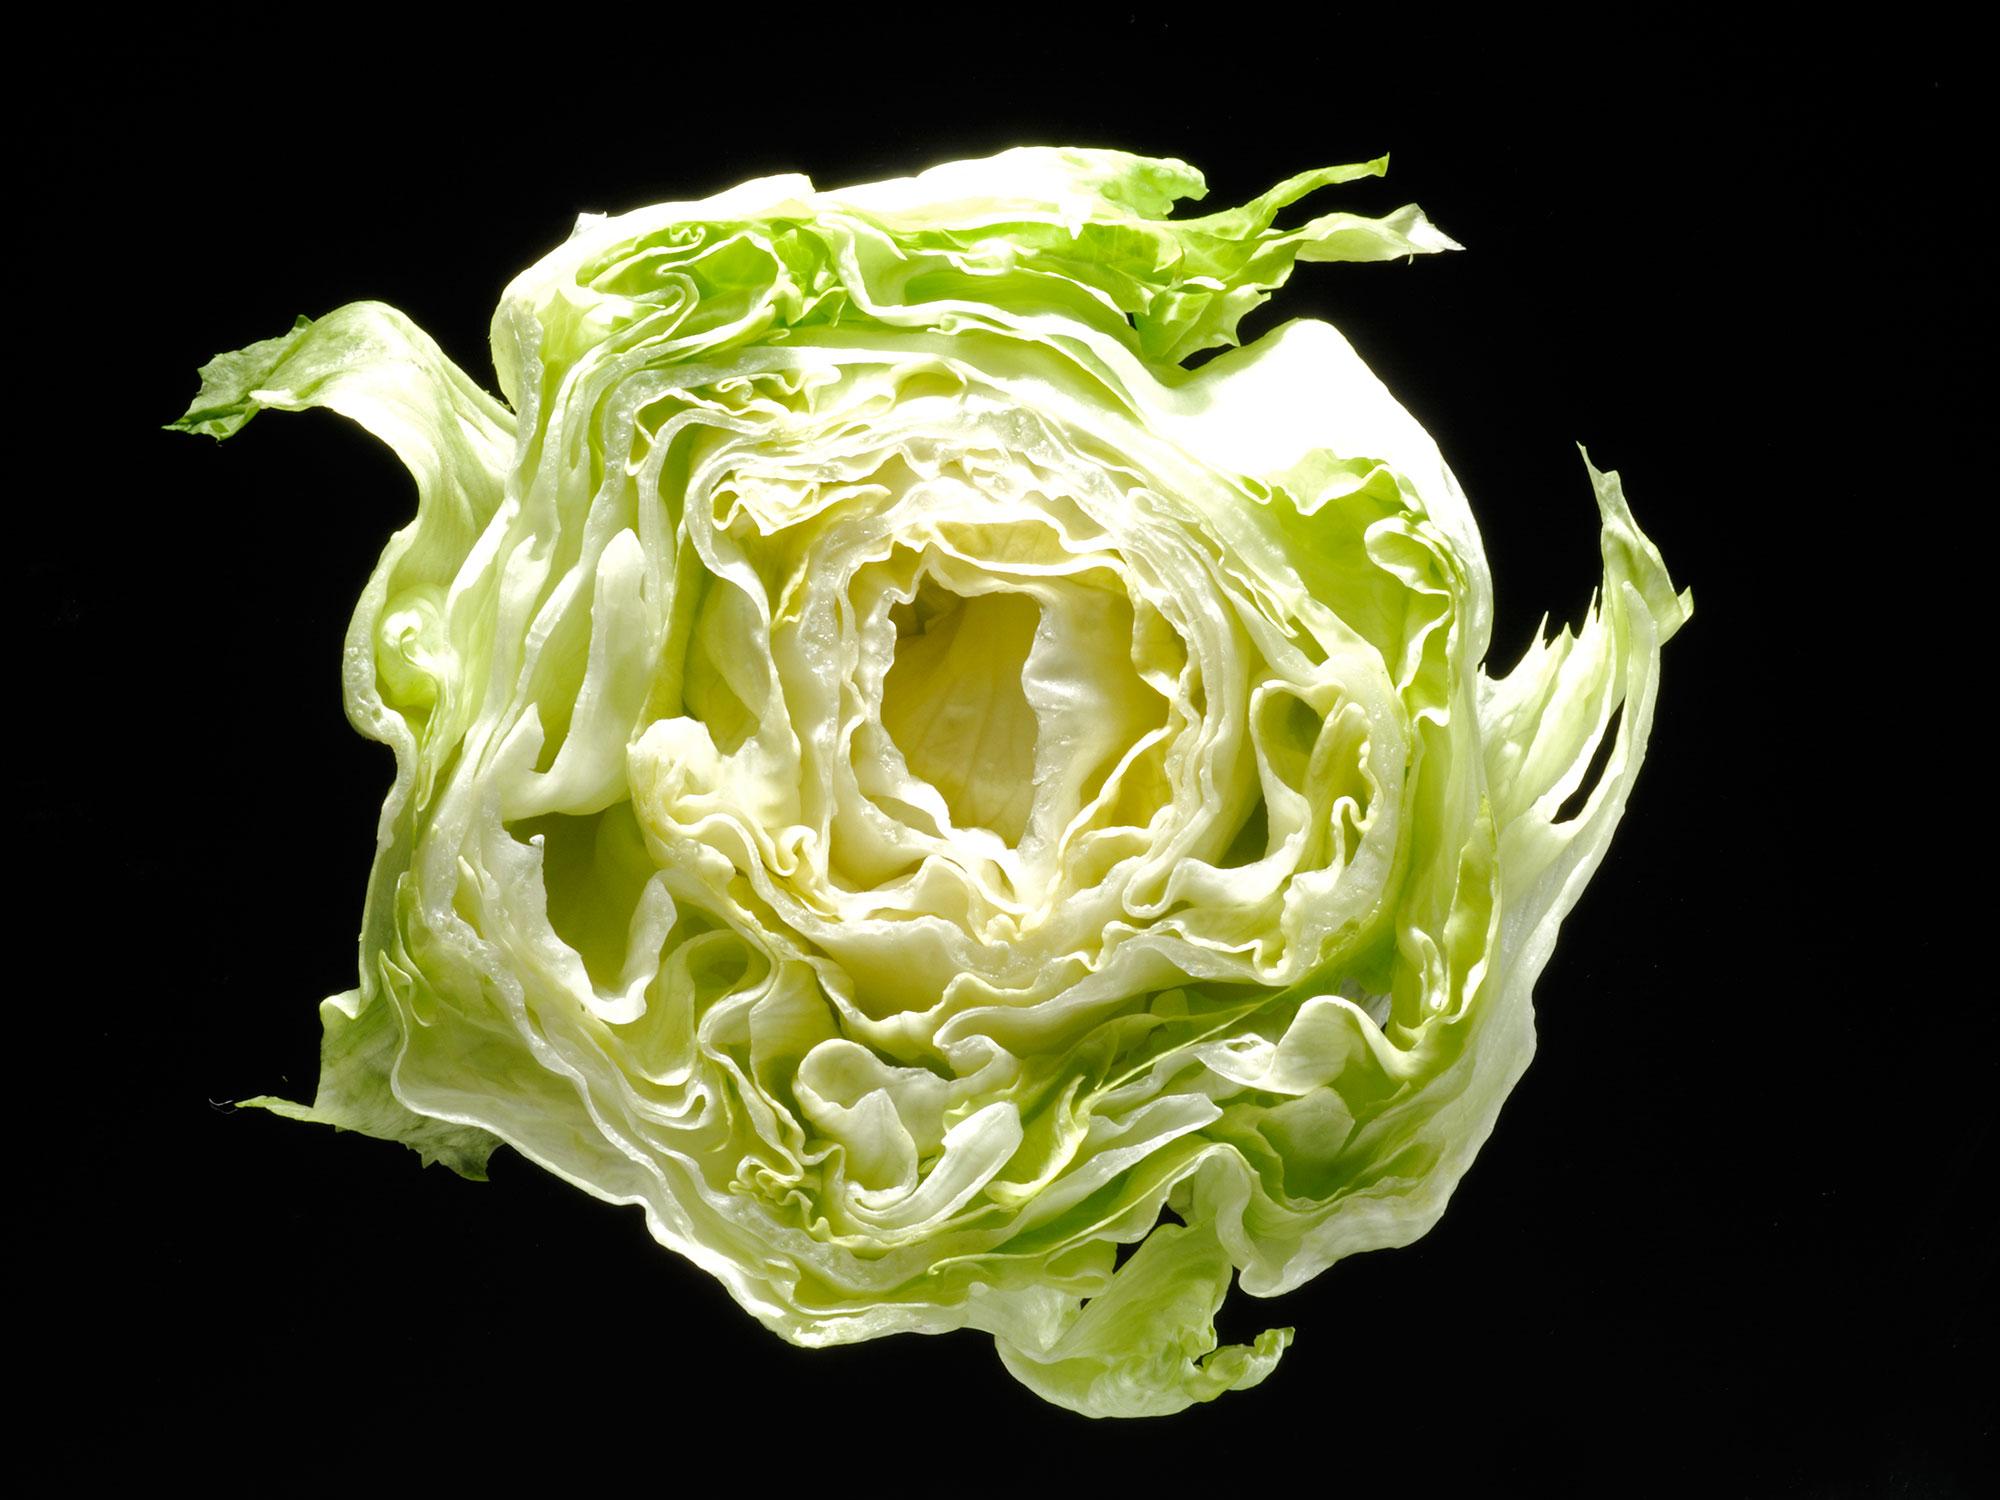 How Healthy Is Iceberg Lettuce, Exactly?